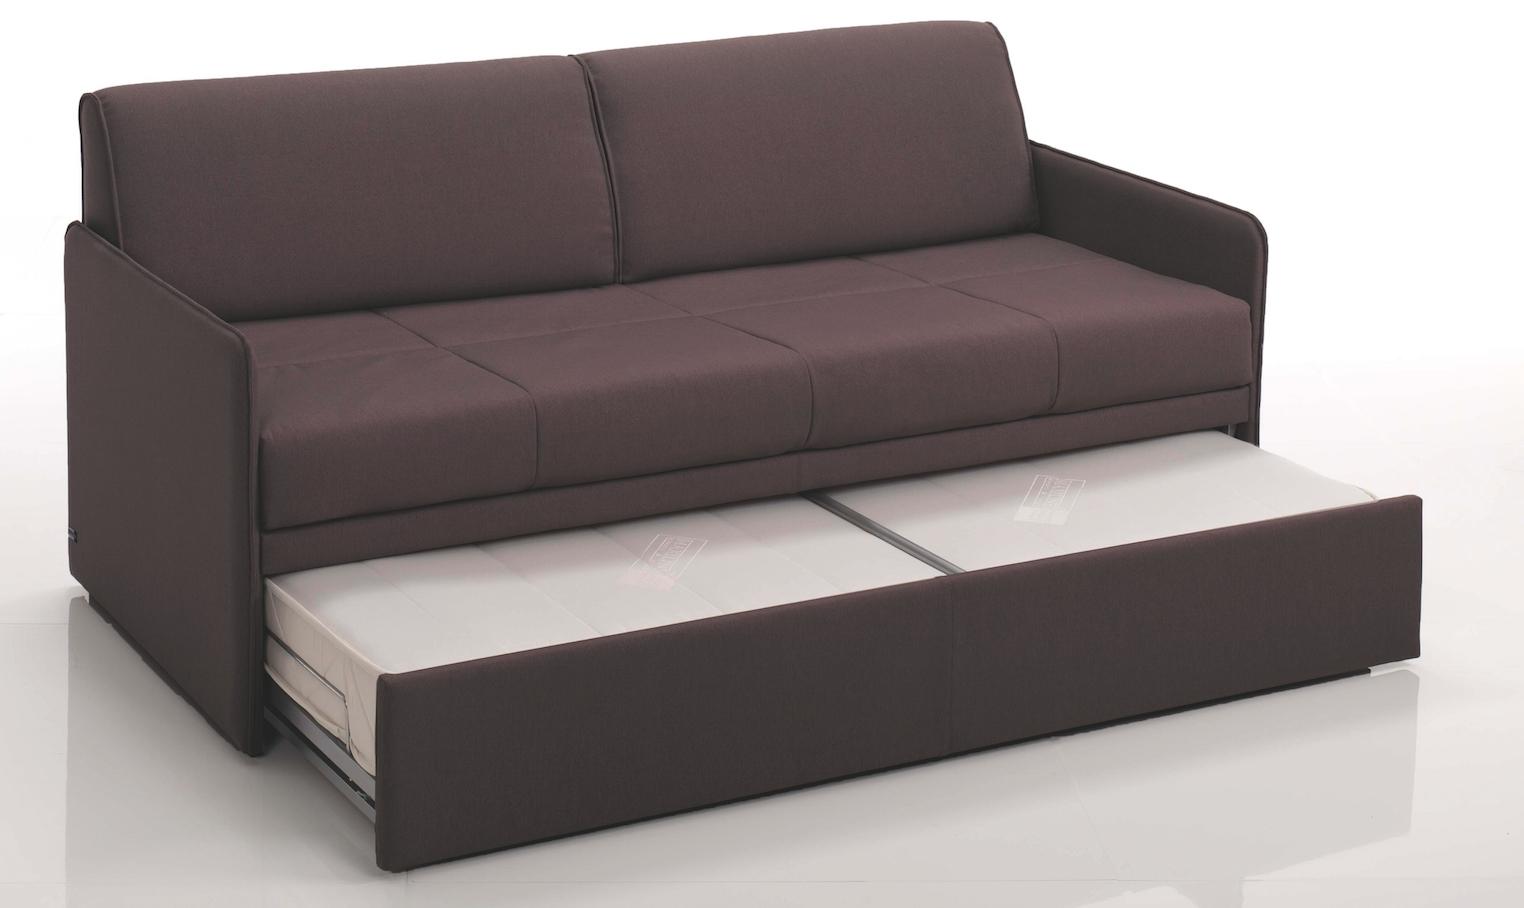 canap convertible gigogne rev tement microfibre marron modane. Black Bedroom Furniture Sets. Home Design Ideas